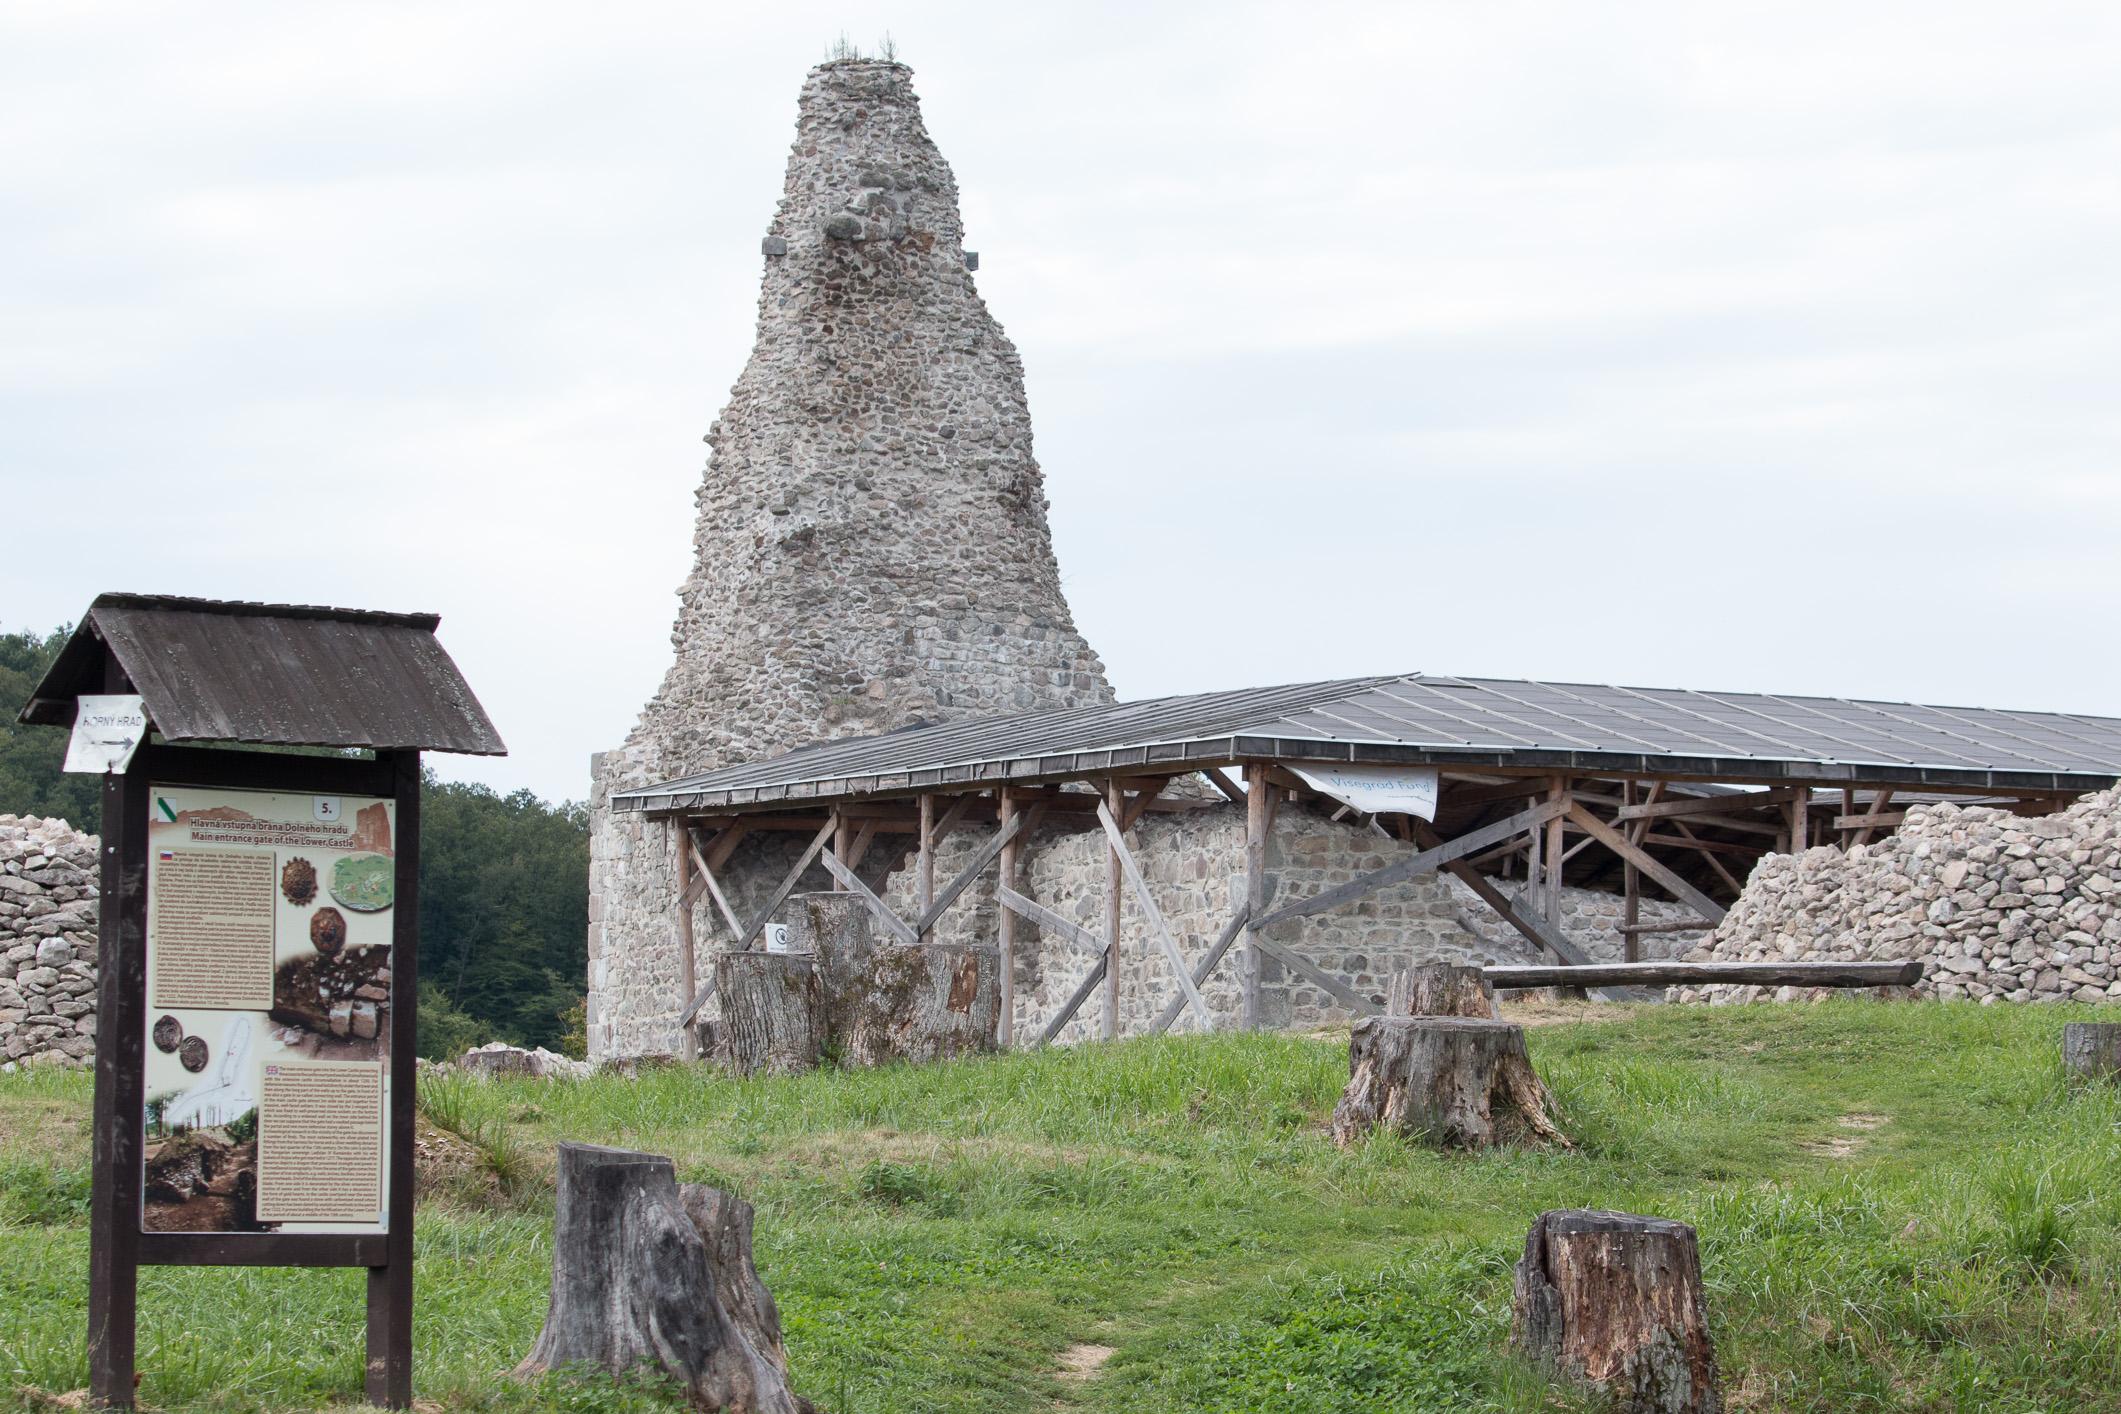 vystup-pusty-hrad-25-zv-113